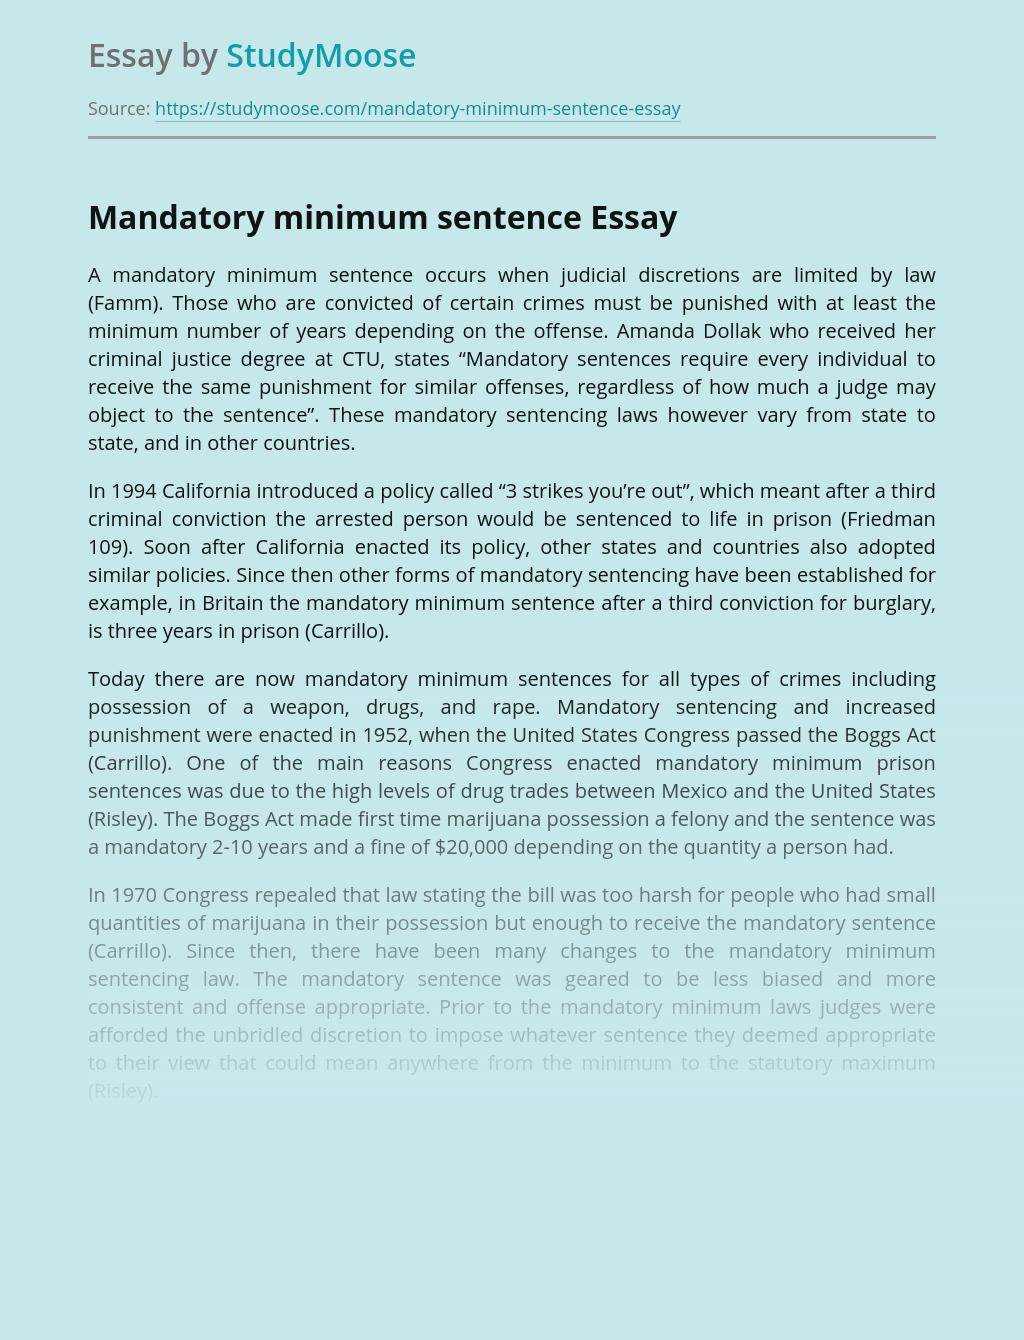 Mandatory Minimum Sentence